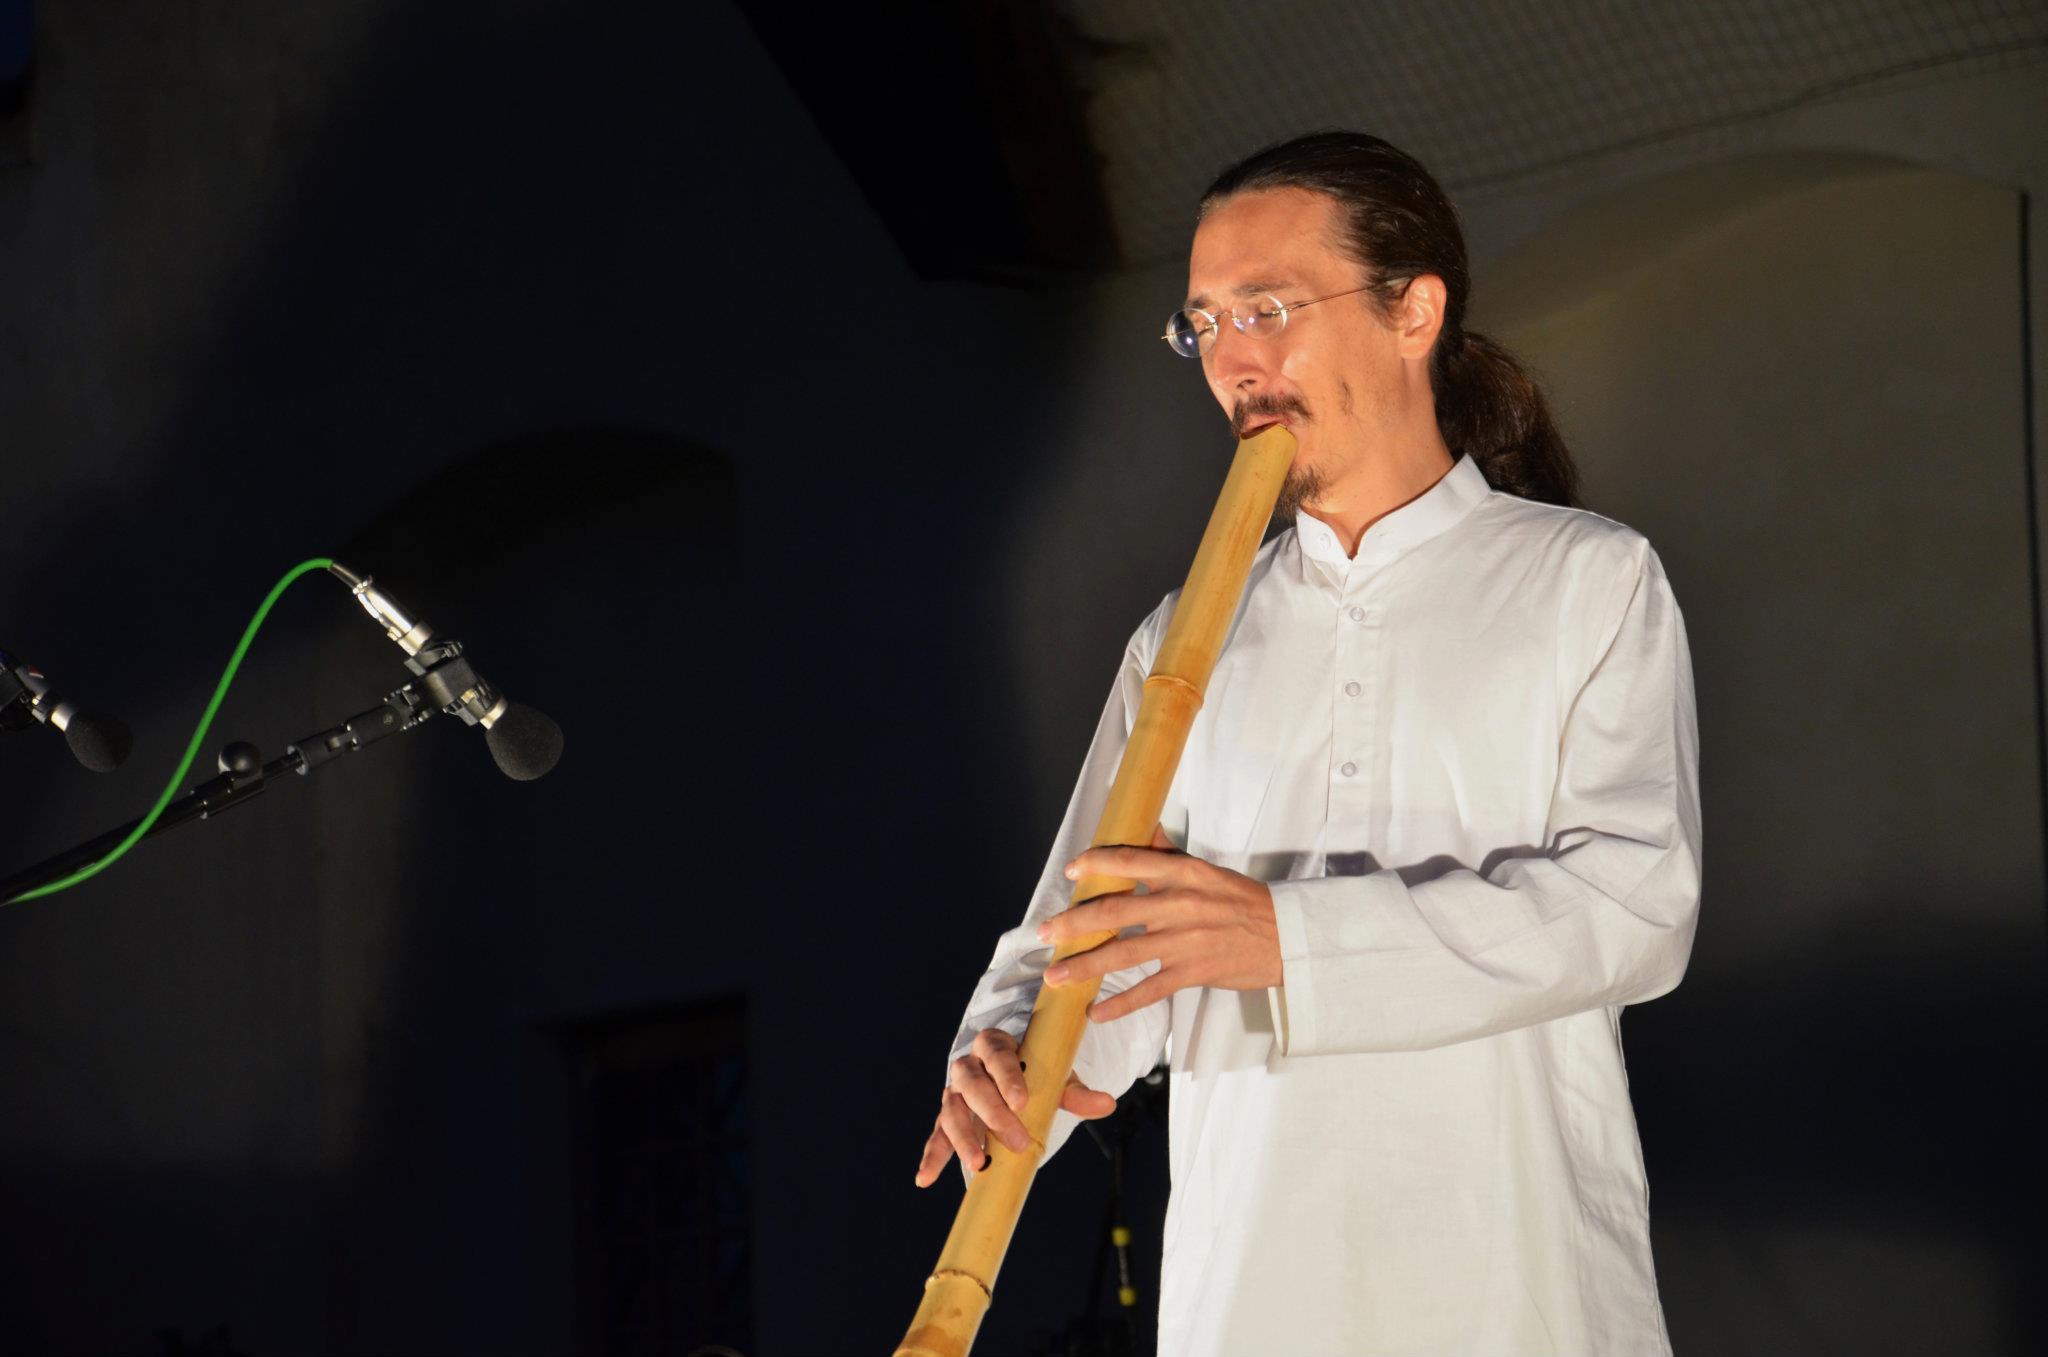 Prague Shakuhachi Festival 2011 opening performance Tamuke, Justin Senryu